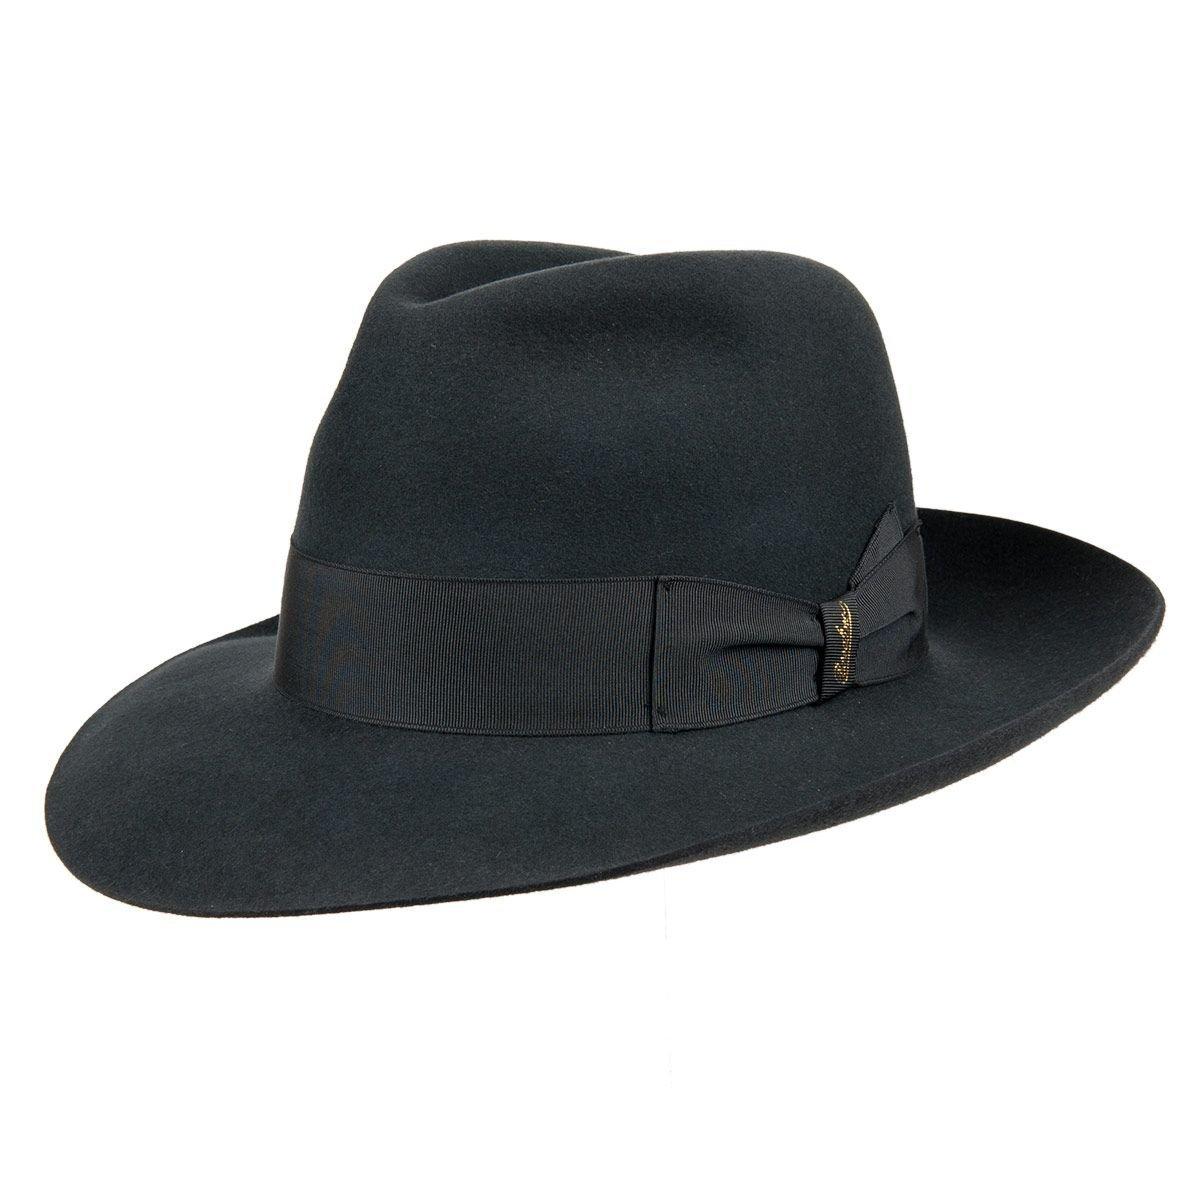 Cappello classico BORSALINO a tesa larga ... afb183d02420